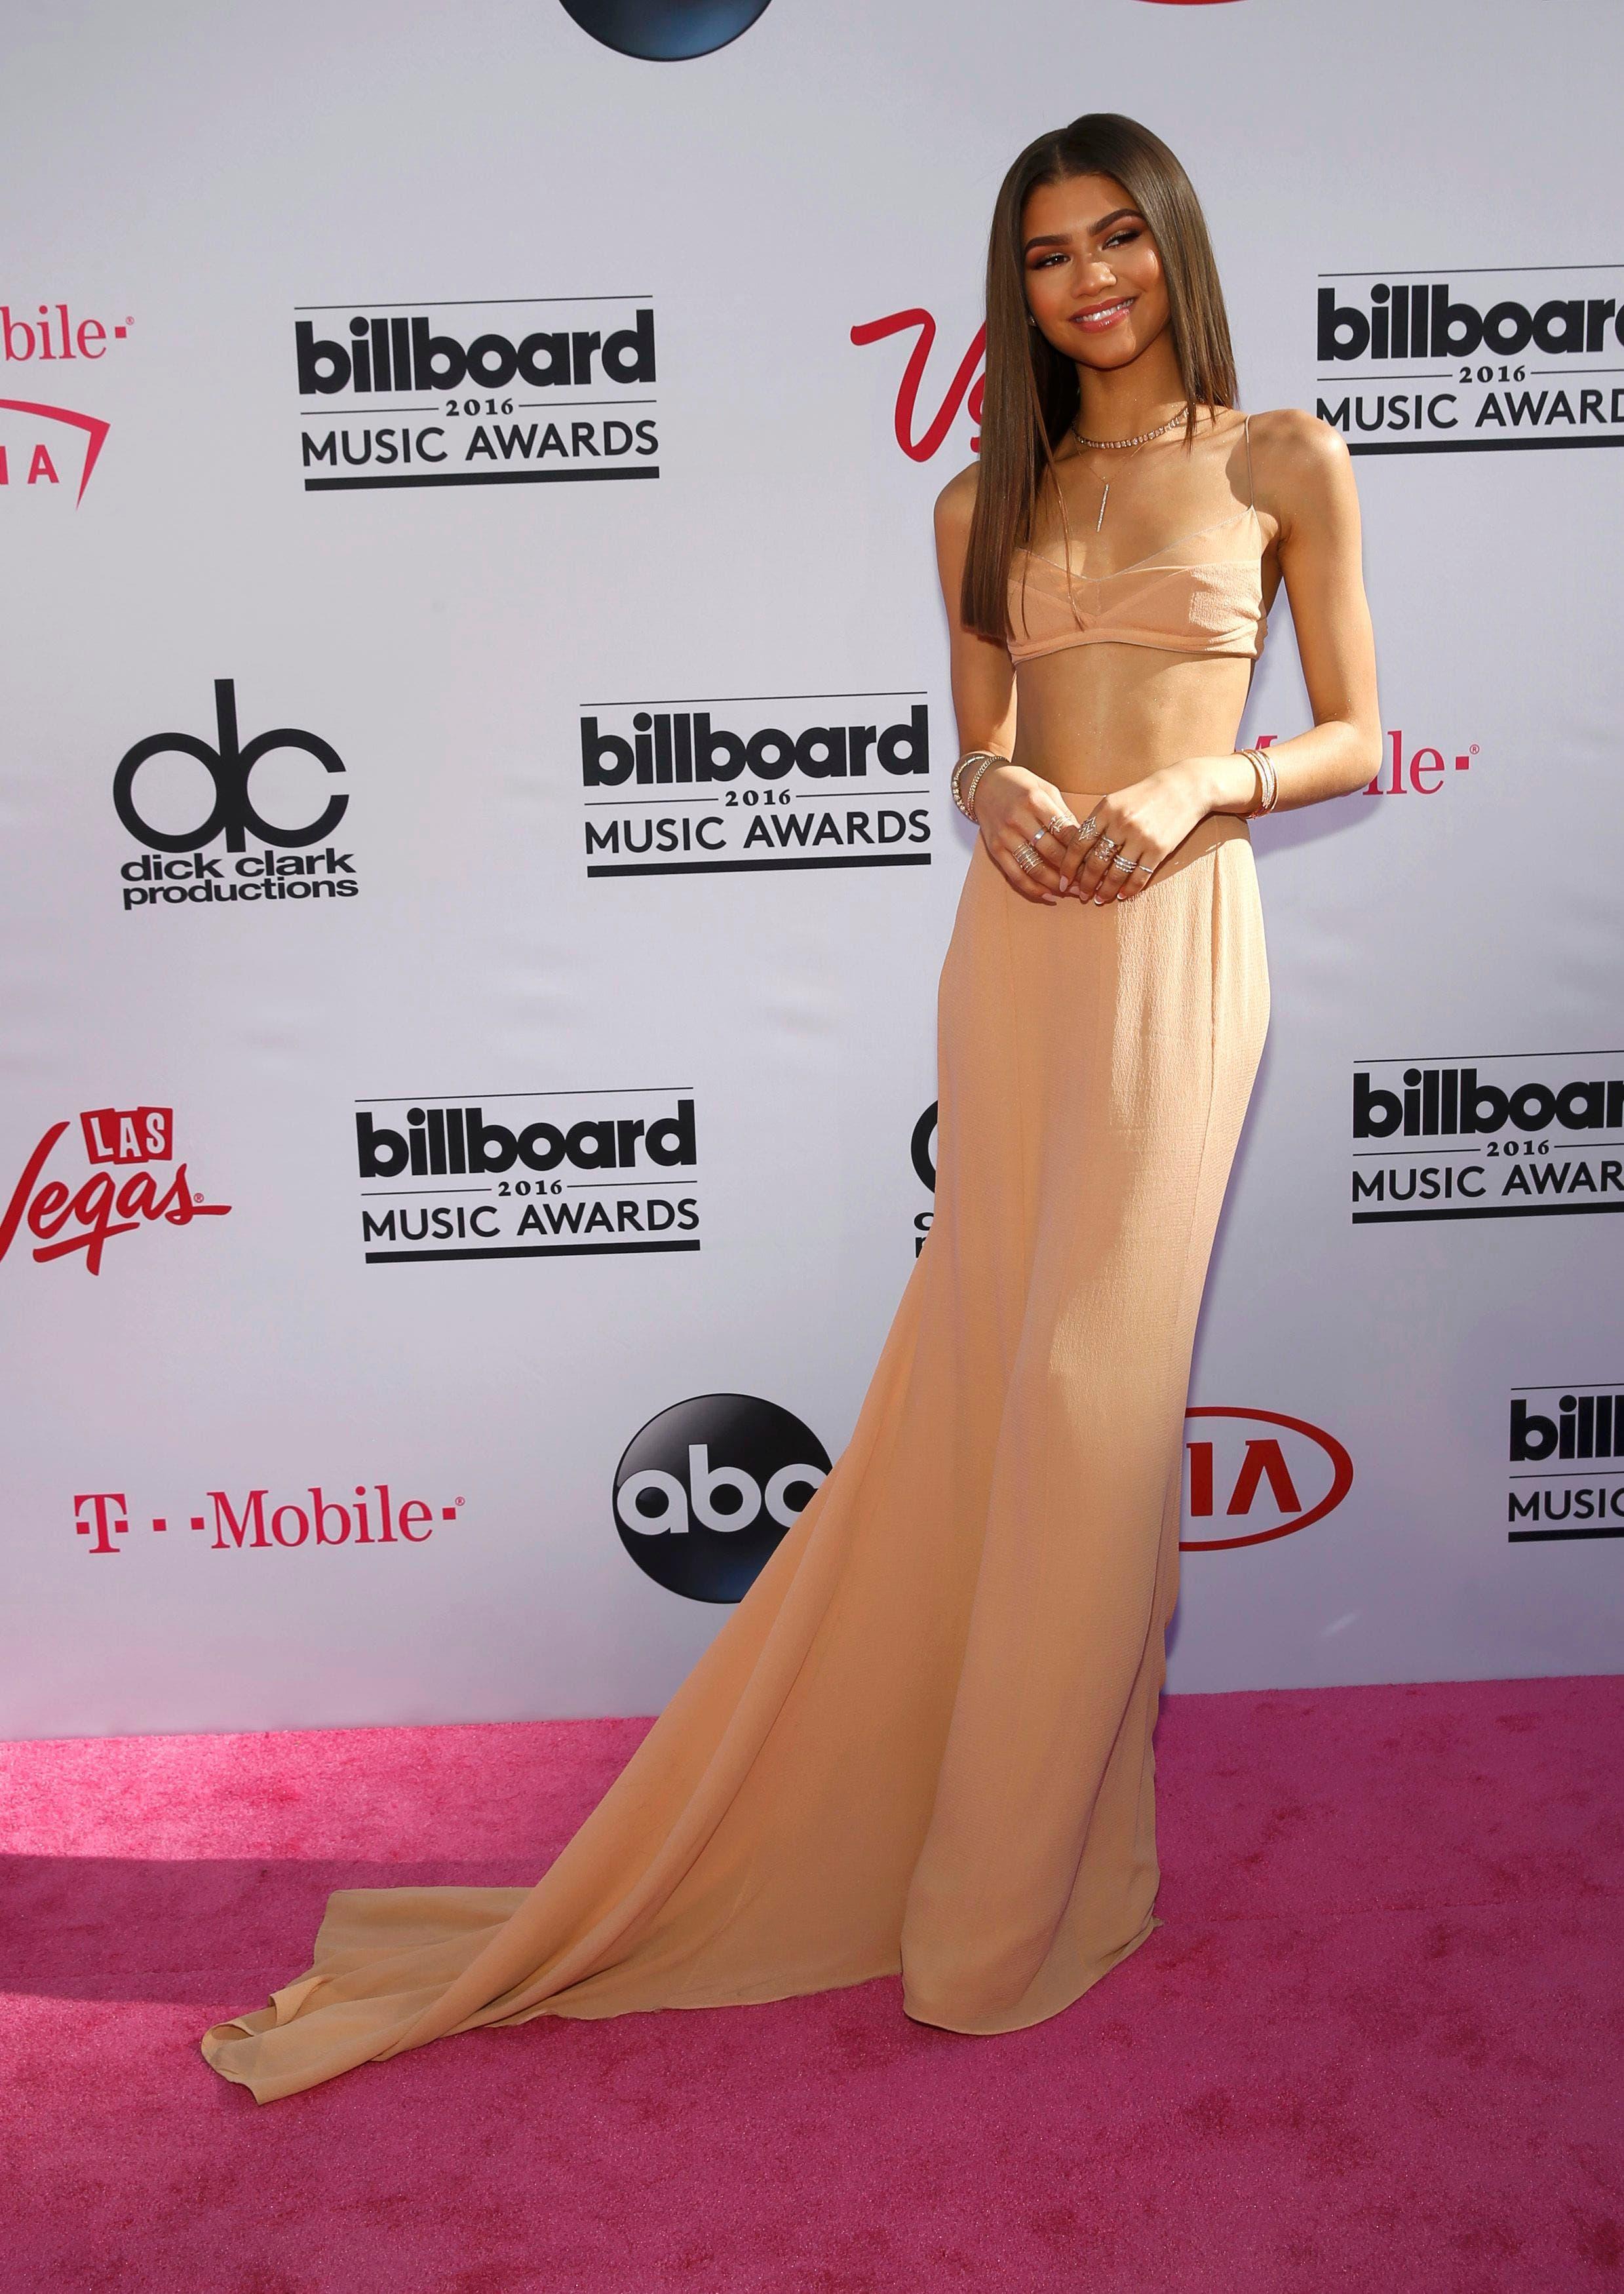 Singer Zendaya arrives at the 2016 Billboard Awards in Las Vegas, Nevada, US, May 22, 2016. (Reuters)